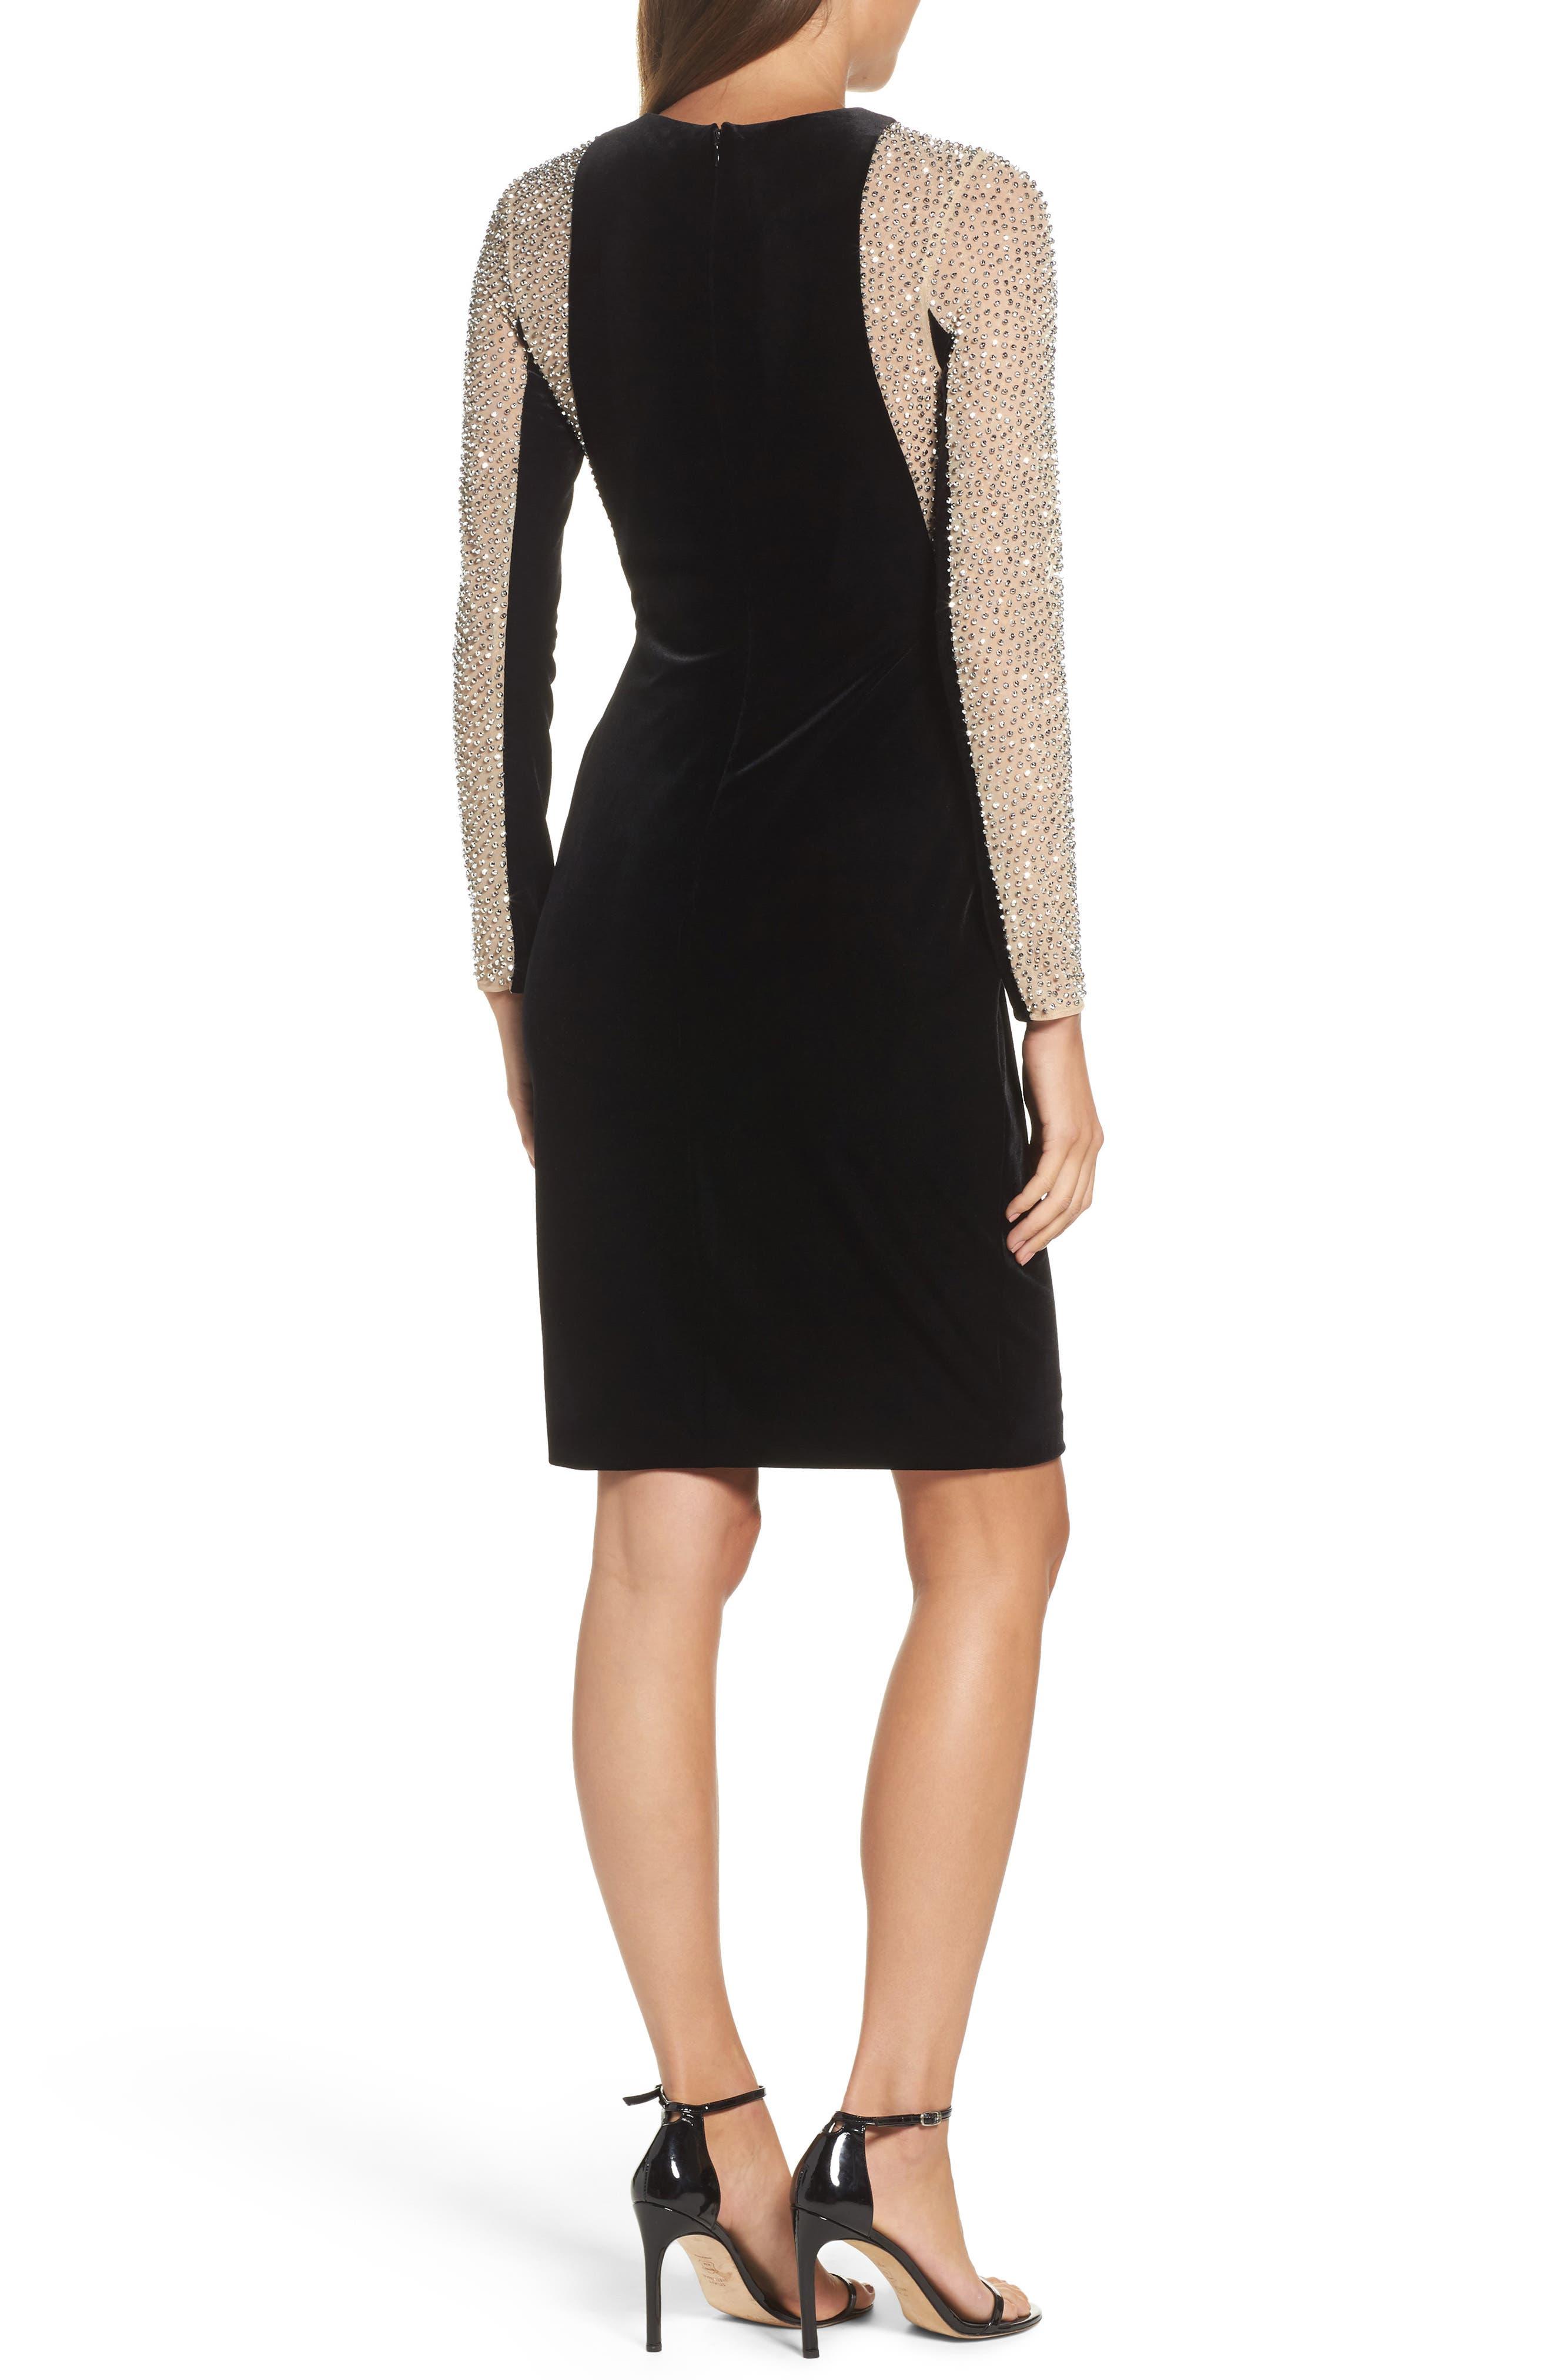 Caviar Bead Mesh Velvet Body-Con Dress,                             Alternate thumbnail 2, color,                             BLACK/ NUDE/ SILVER